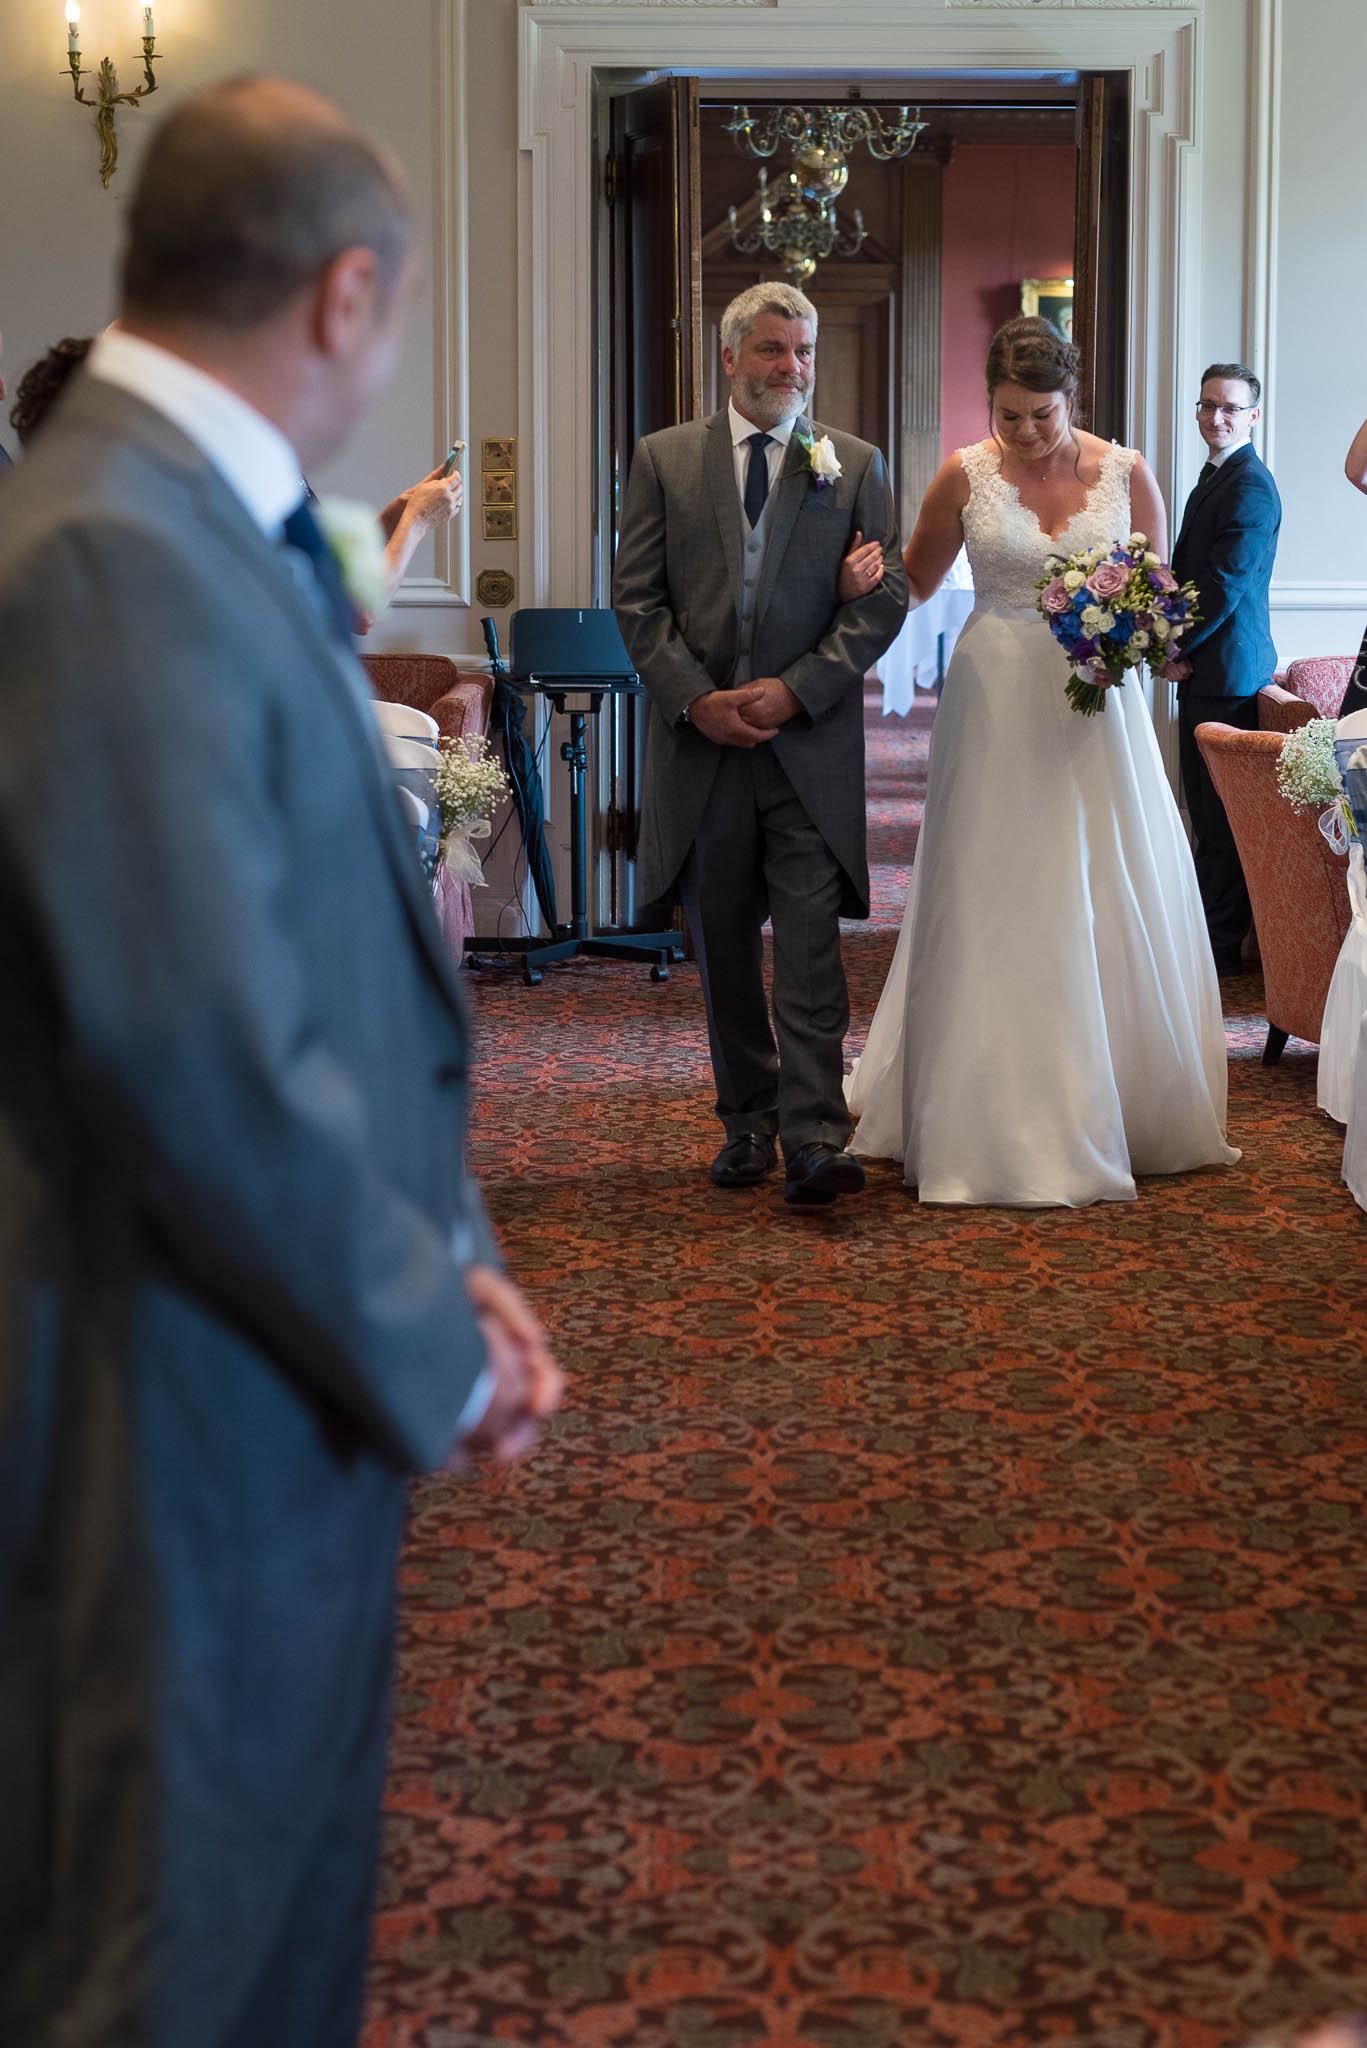 Crathorne Hall Hotel Wedding Photographer52.jpg